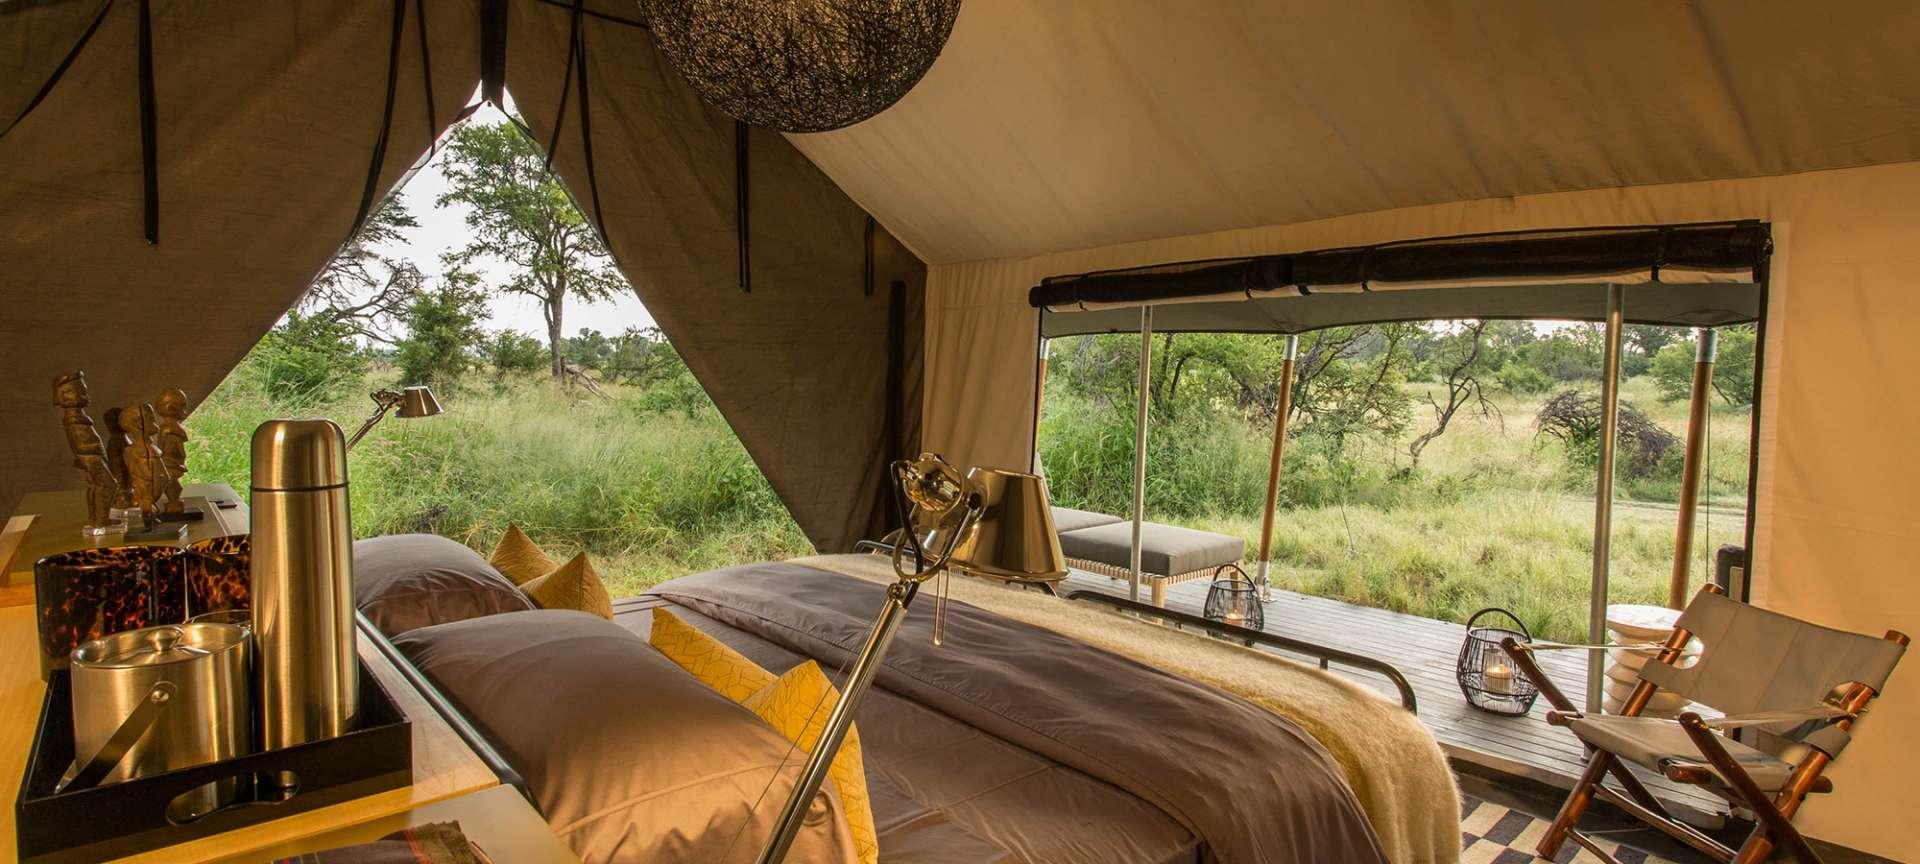 Gomoti Plains Camp, Okavango Delta, Botswana | Discover